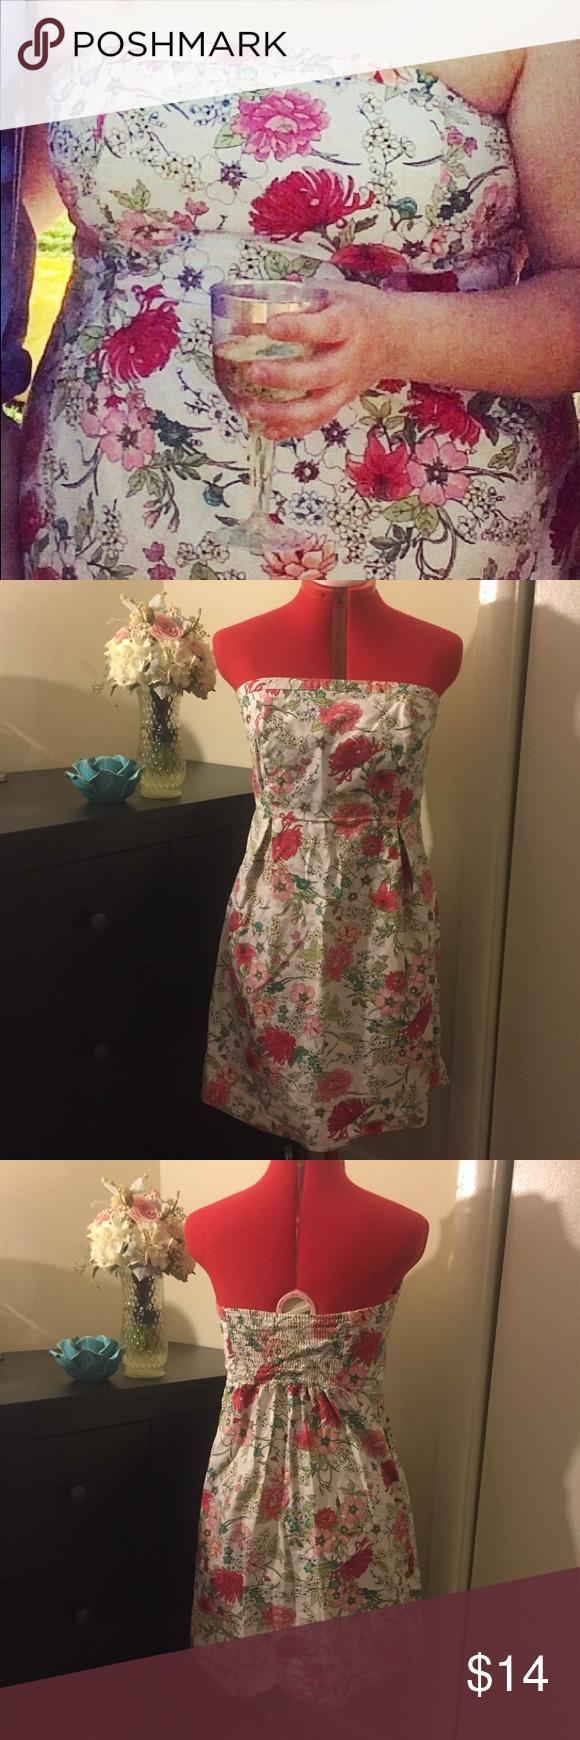 Old Navy Strapless Sundress Size 12 My Posh Closet Pinterest